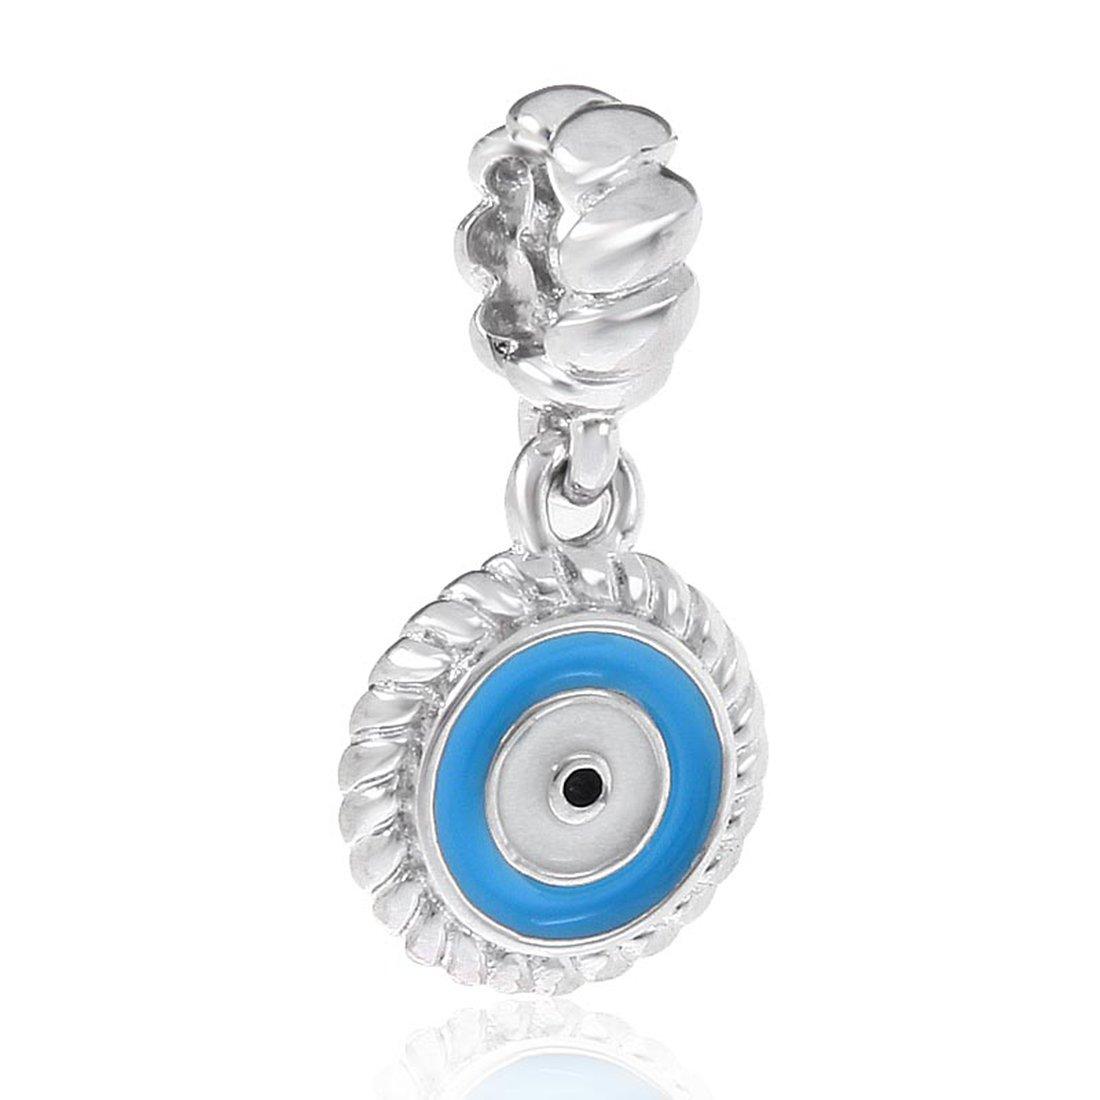 c10c768d3 Amazon.com: 925 Sterling Silver Evil Eye Charm Angel Charm Symbol Charm  Halloween Charm for Pandora Charms Bracelet (A): Arts, Crafts & Sewing